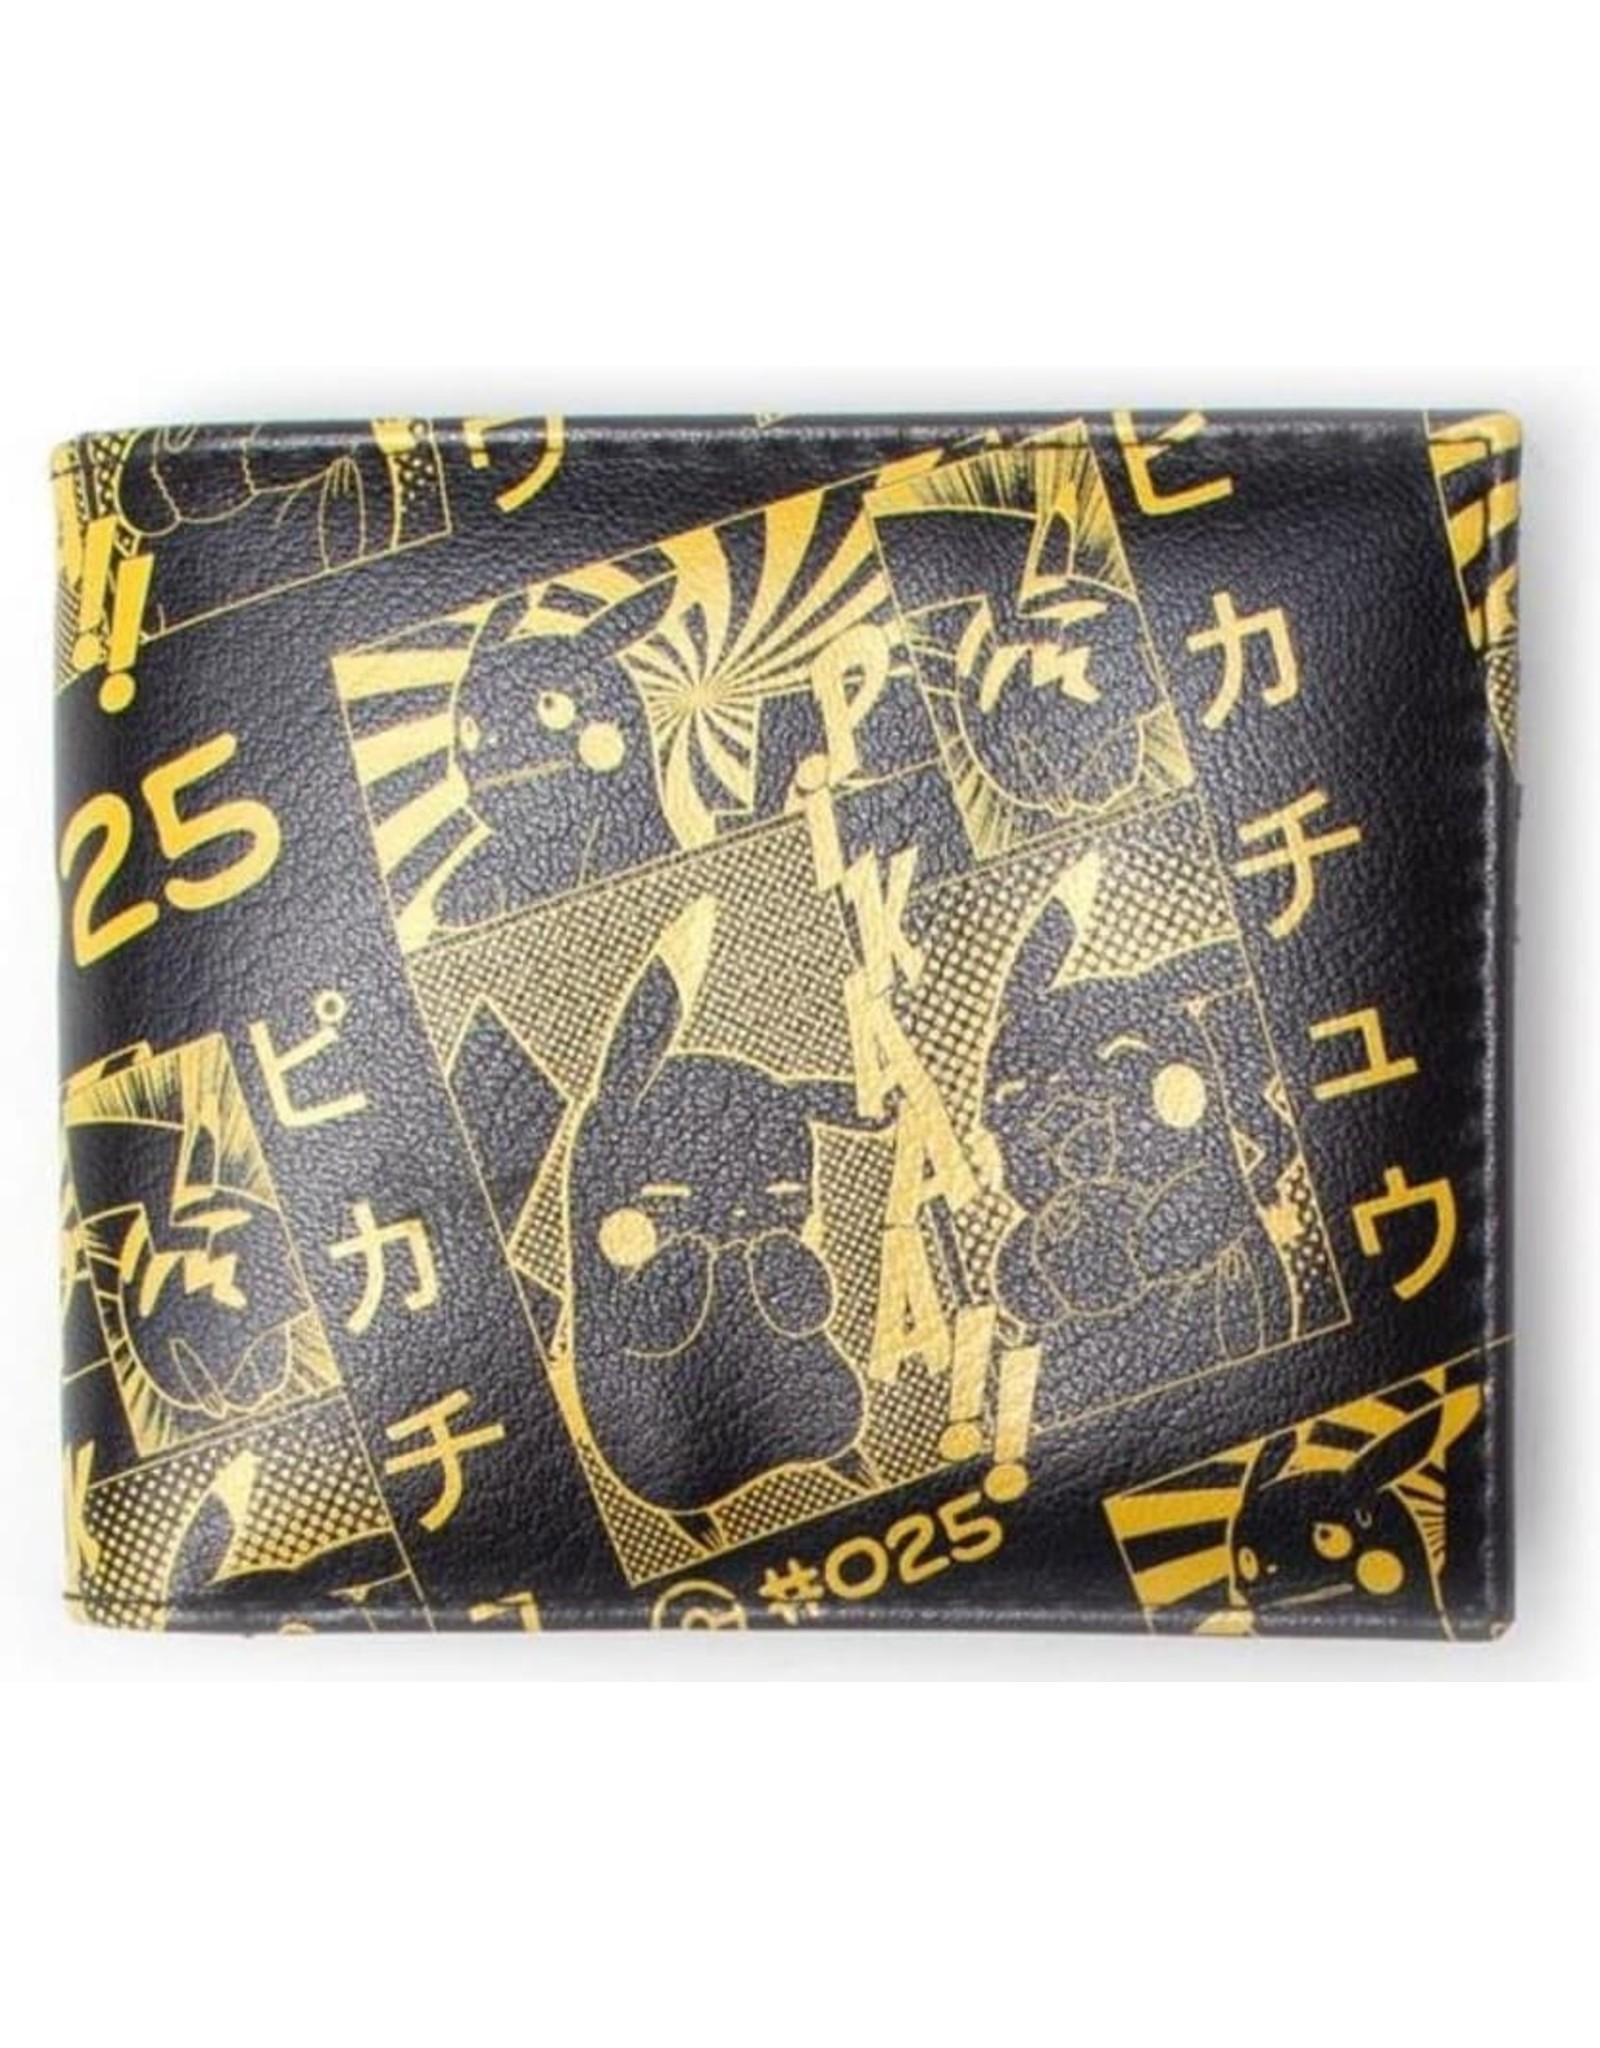 Pokemon Merchandise portemonnees - Pokemon Pikachu Manga portemonnee